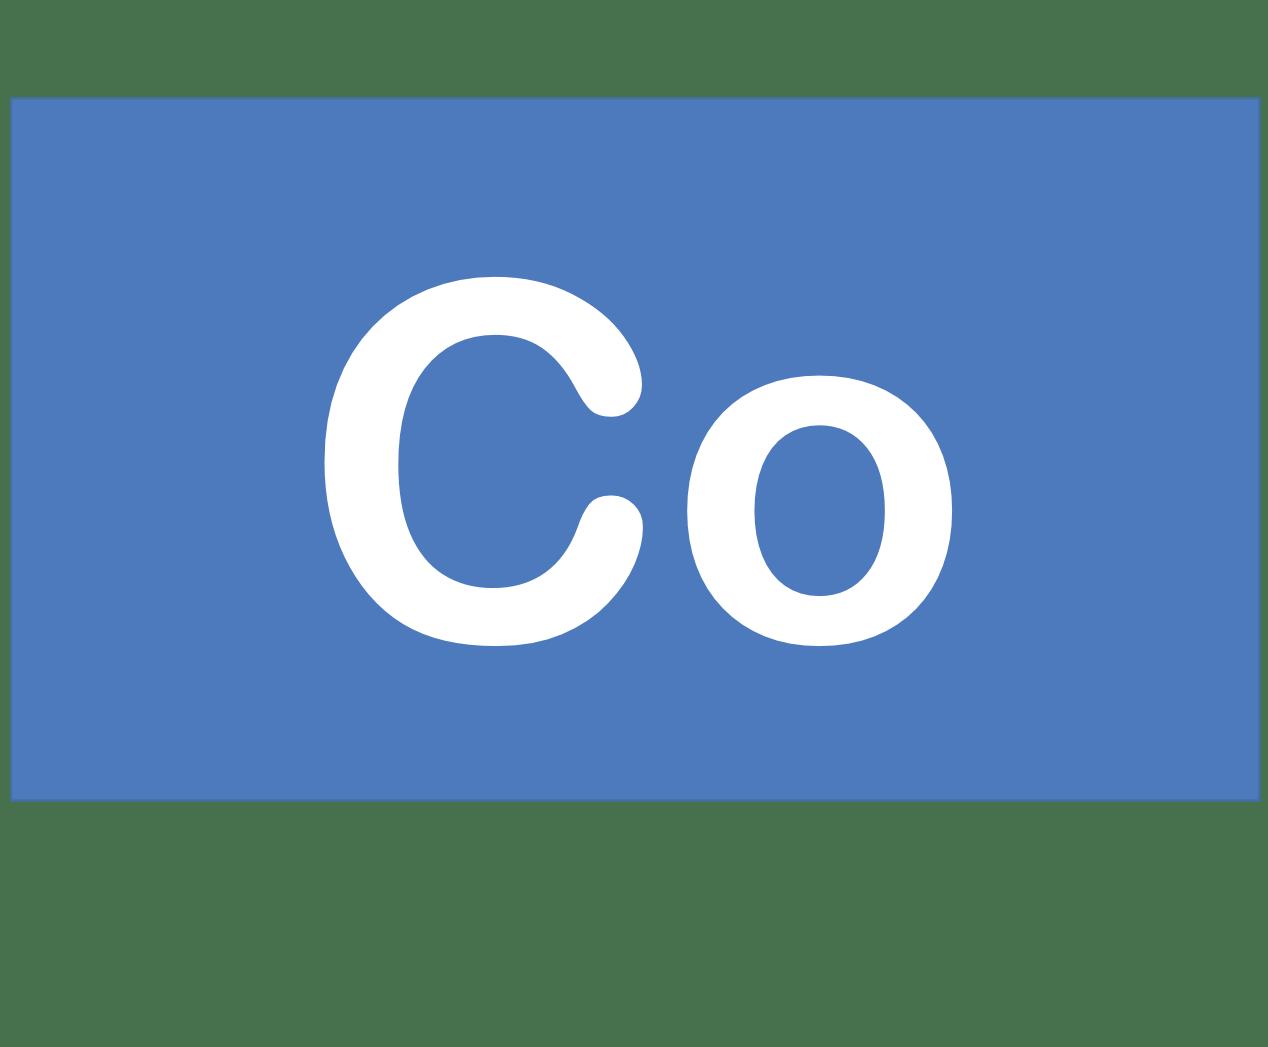 27 Co コバルト Cobalt 元素 記号 周期表 化学 原子